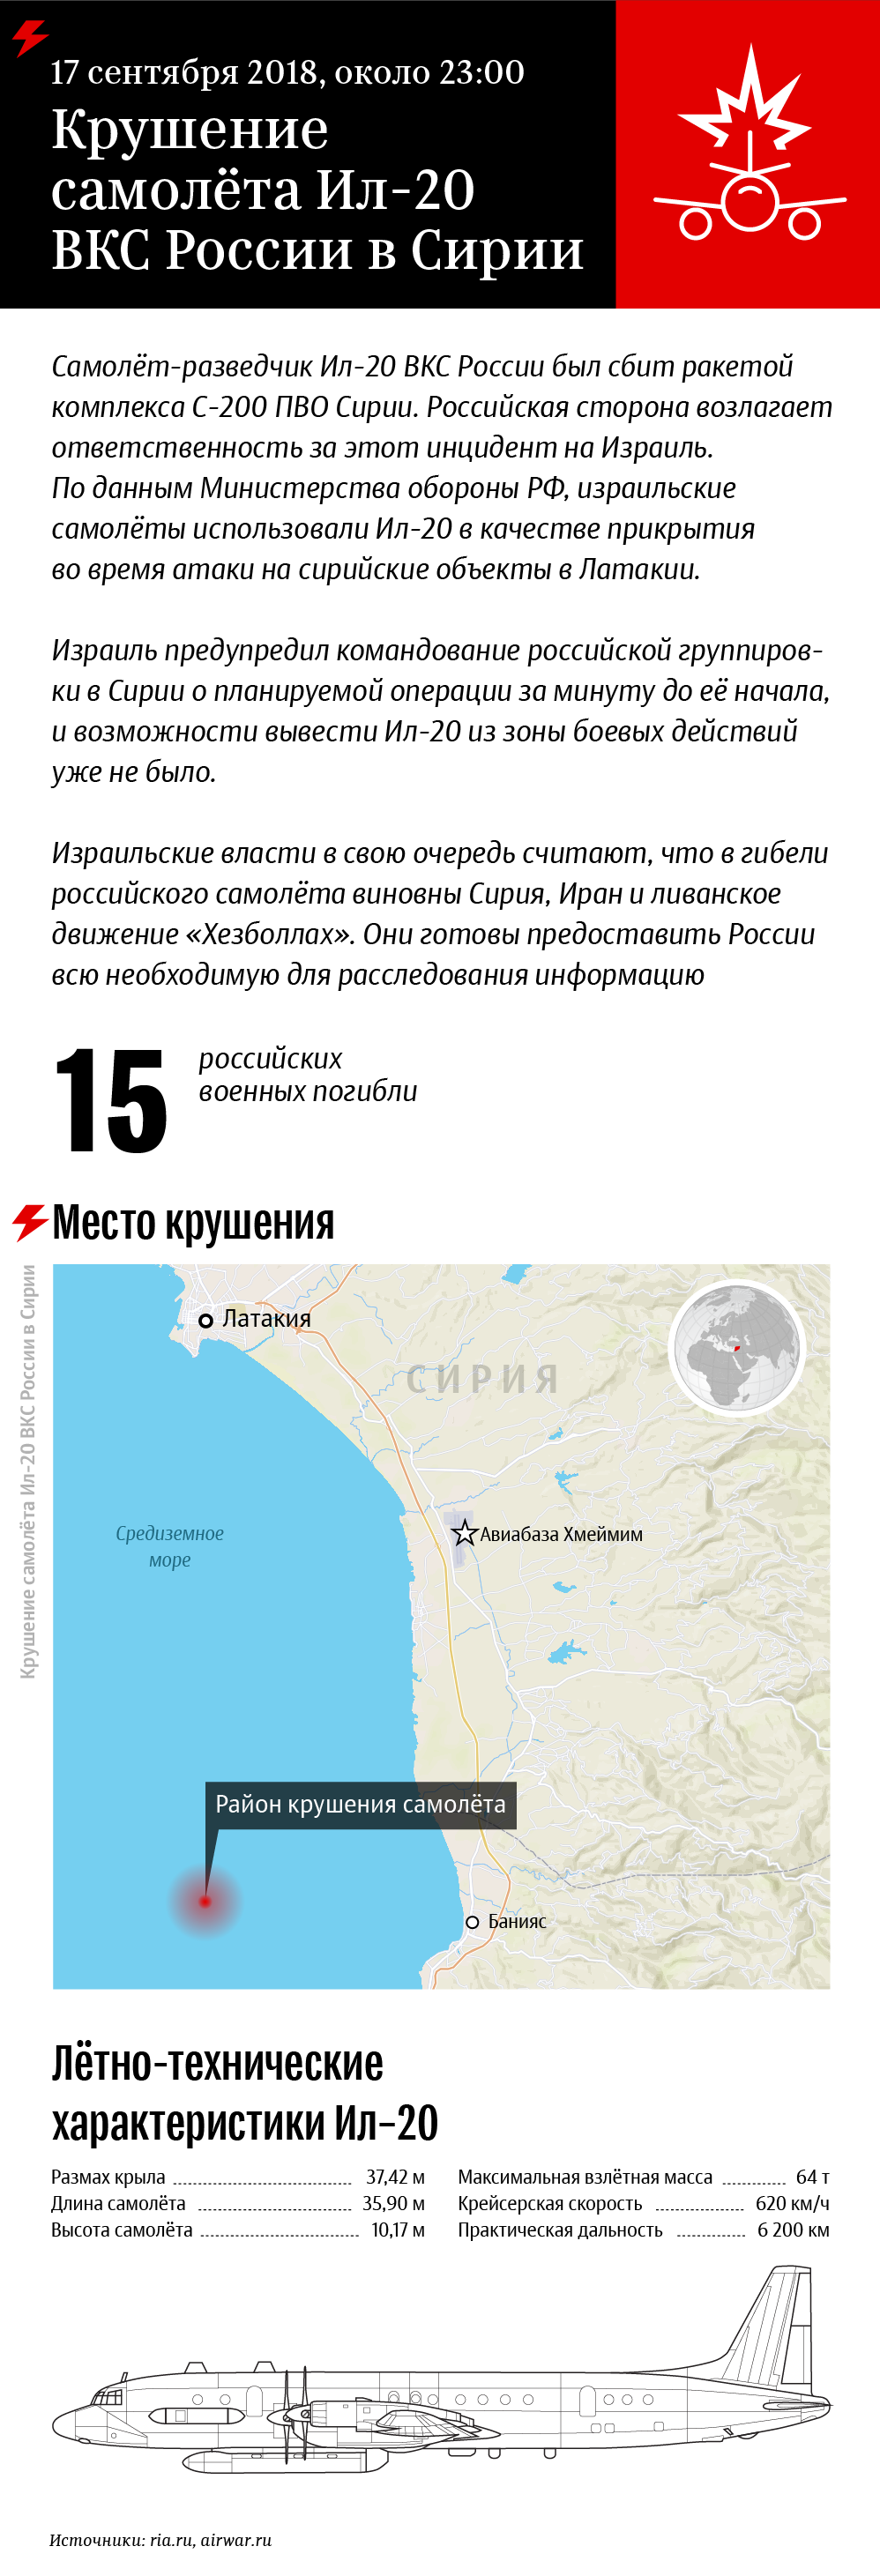 https://cdn2.img.ria.ru/images/152883/43/1528834376.png